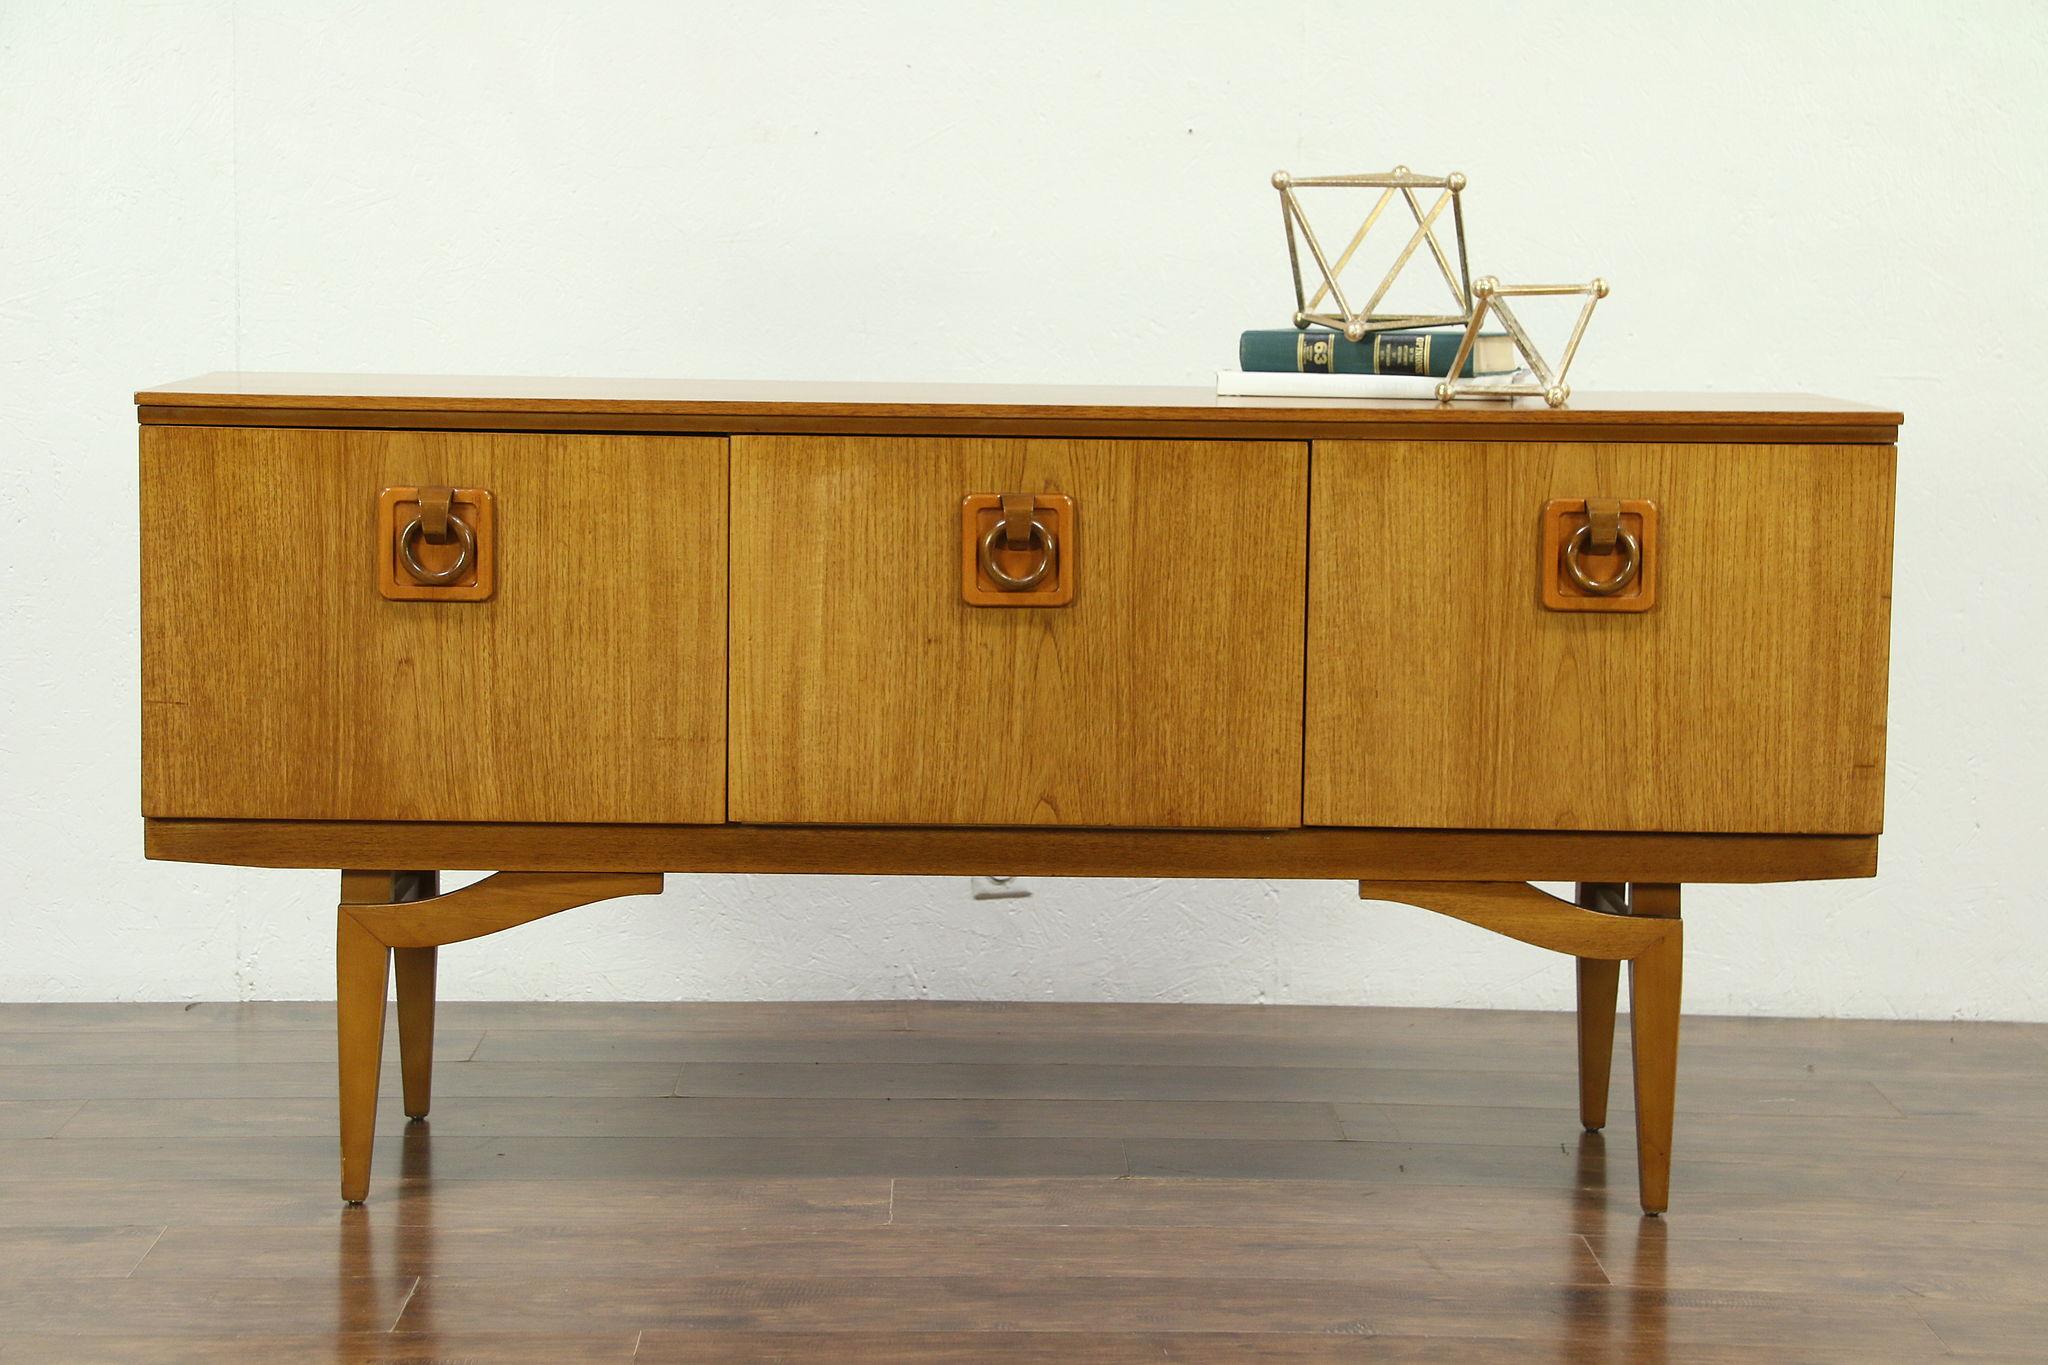 Midcentury modern 1960 vintage teak bar cabinet wide tv console